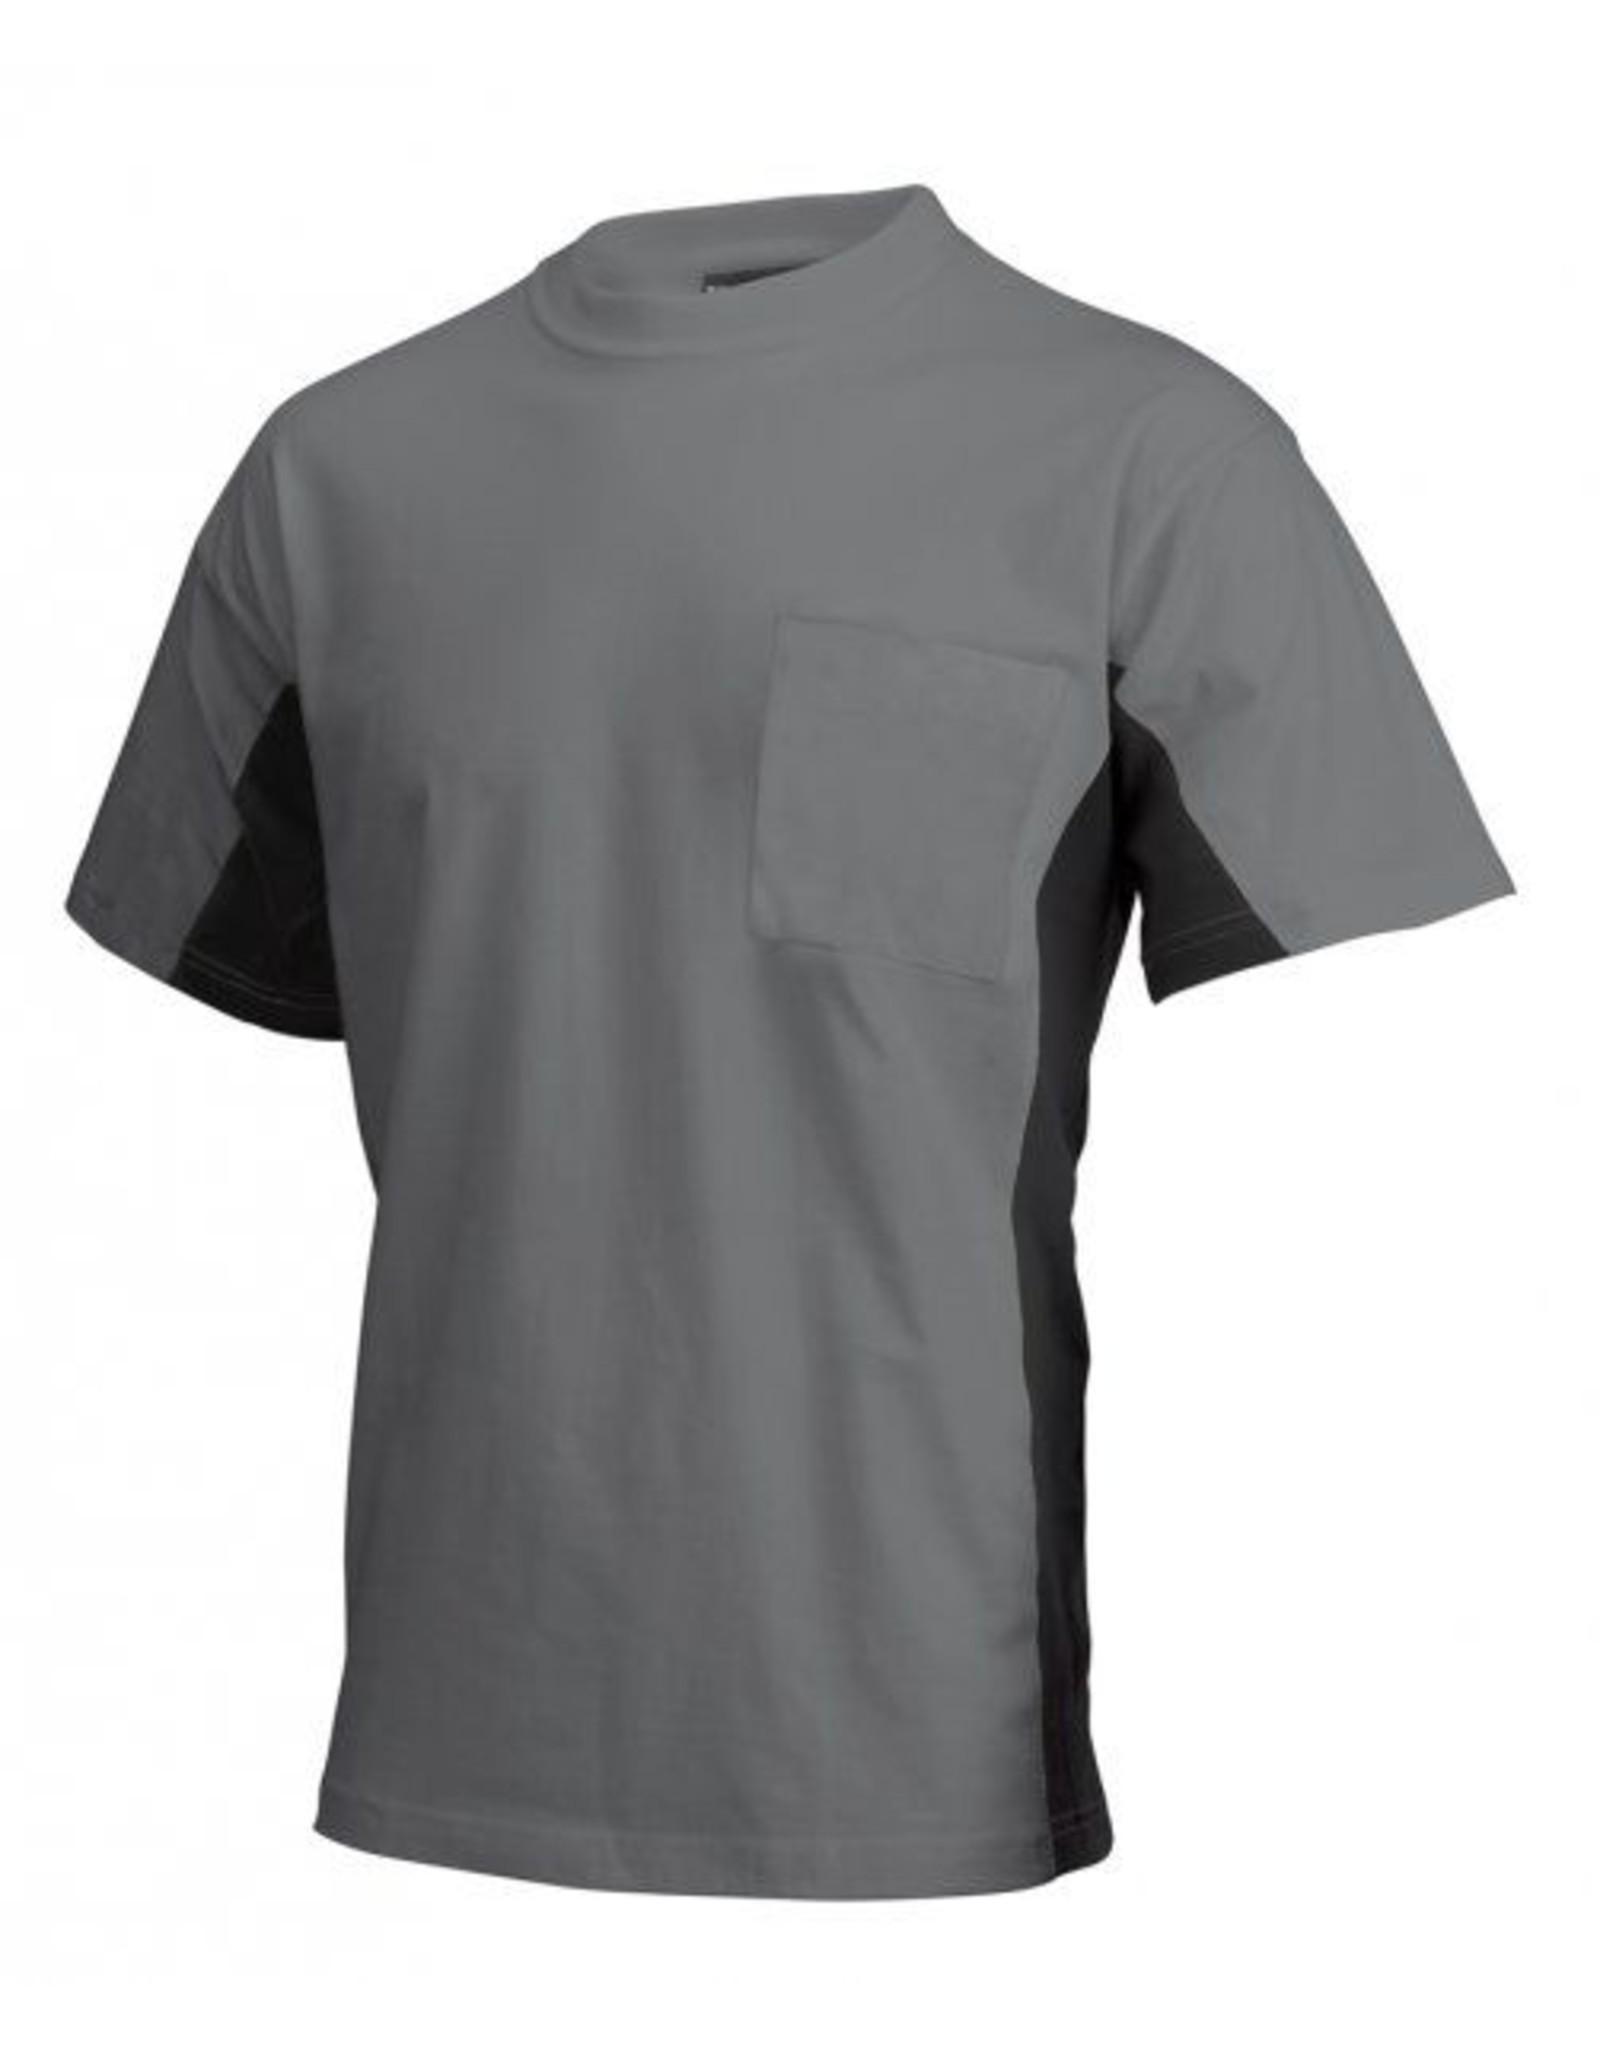 Tricorp T-shirt Bi-color 102002 Tricorp